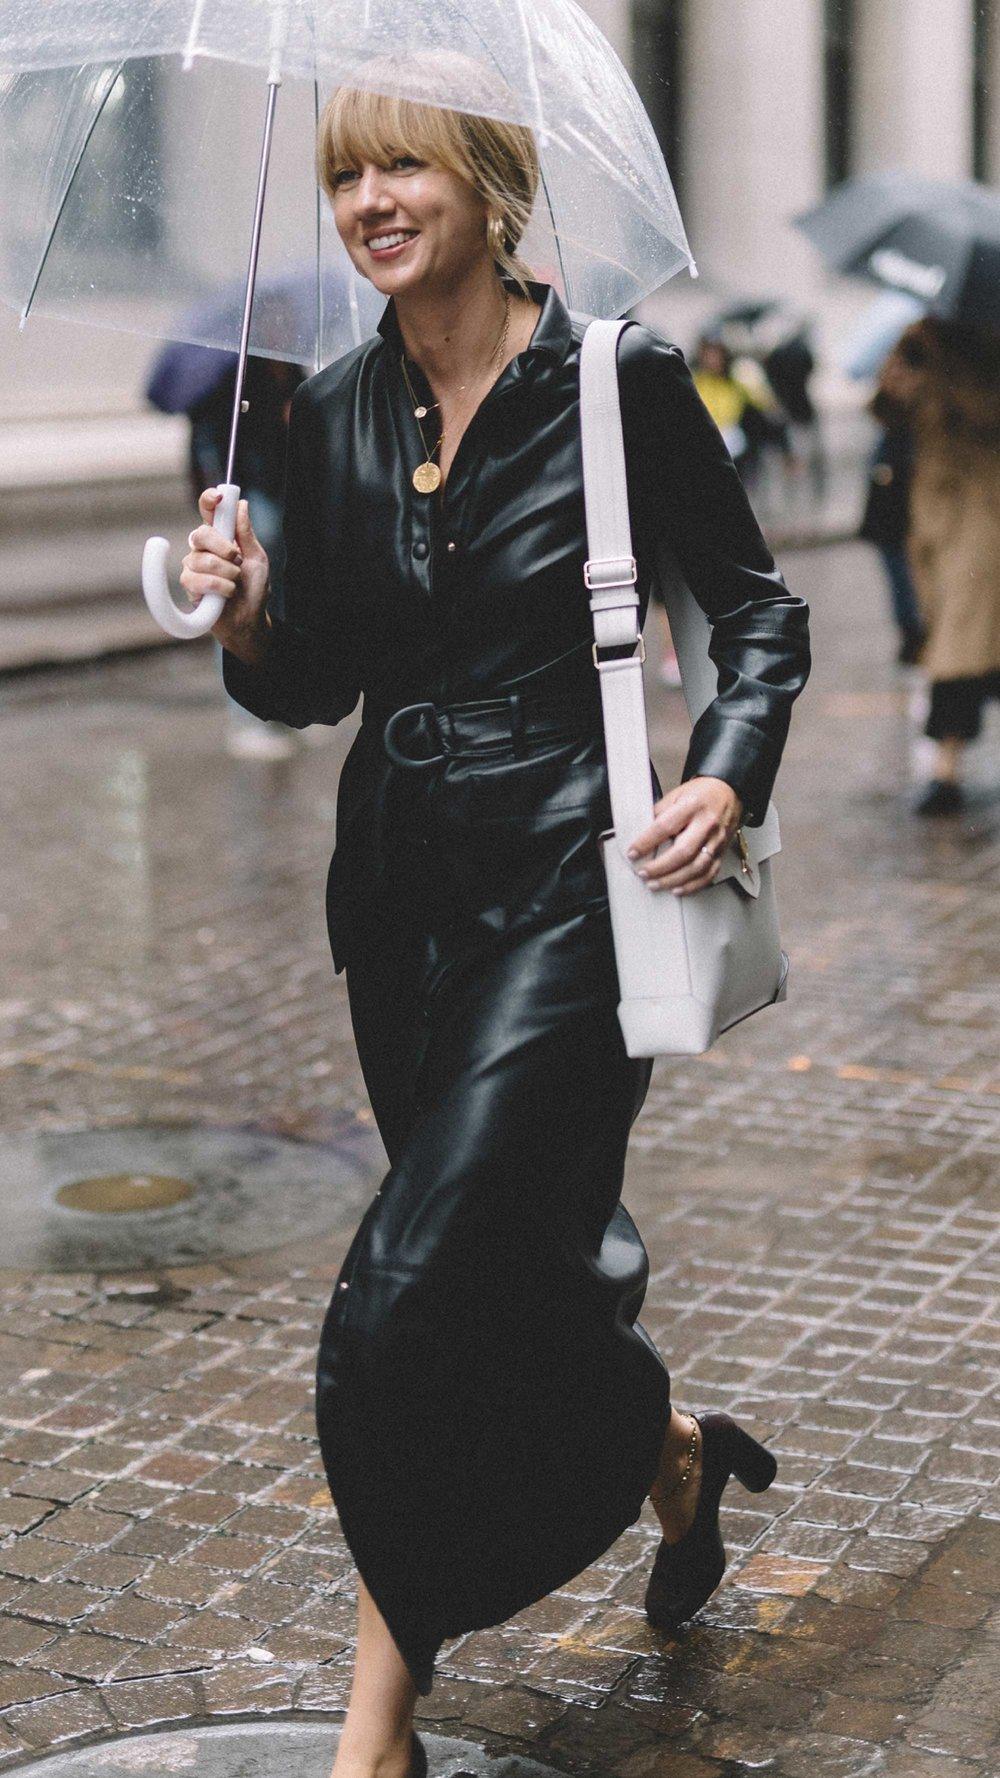 New-York-Fashion-Week-NYFW-SS18-street-style-day-five-SS18323.jpg